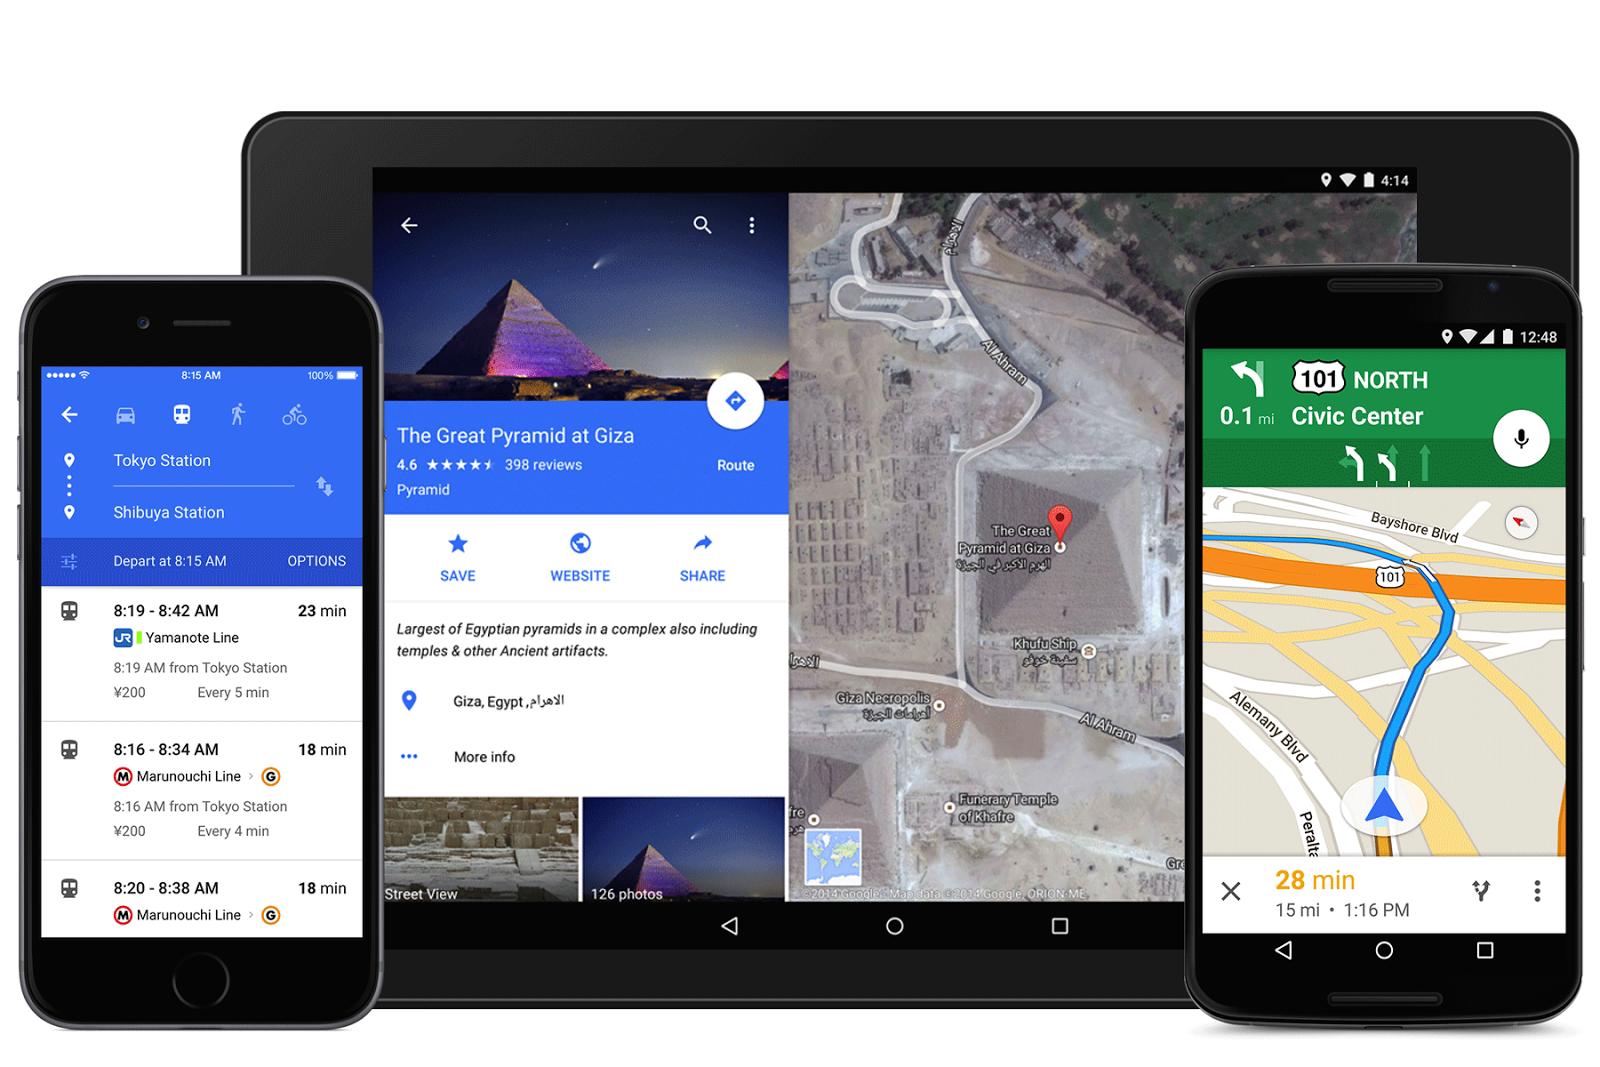 Google Maps 9 material